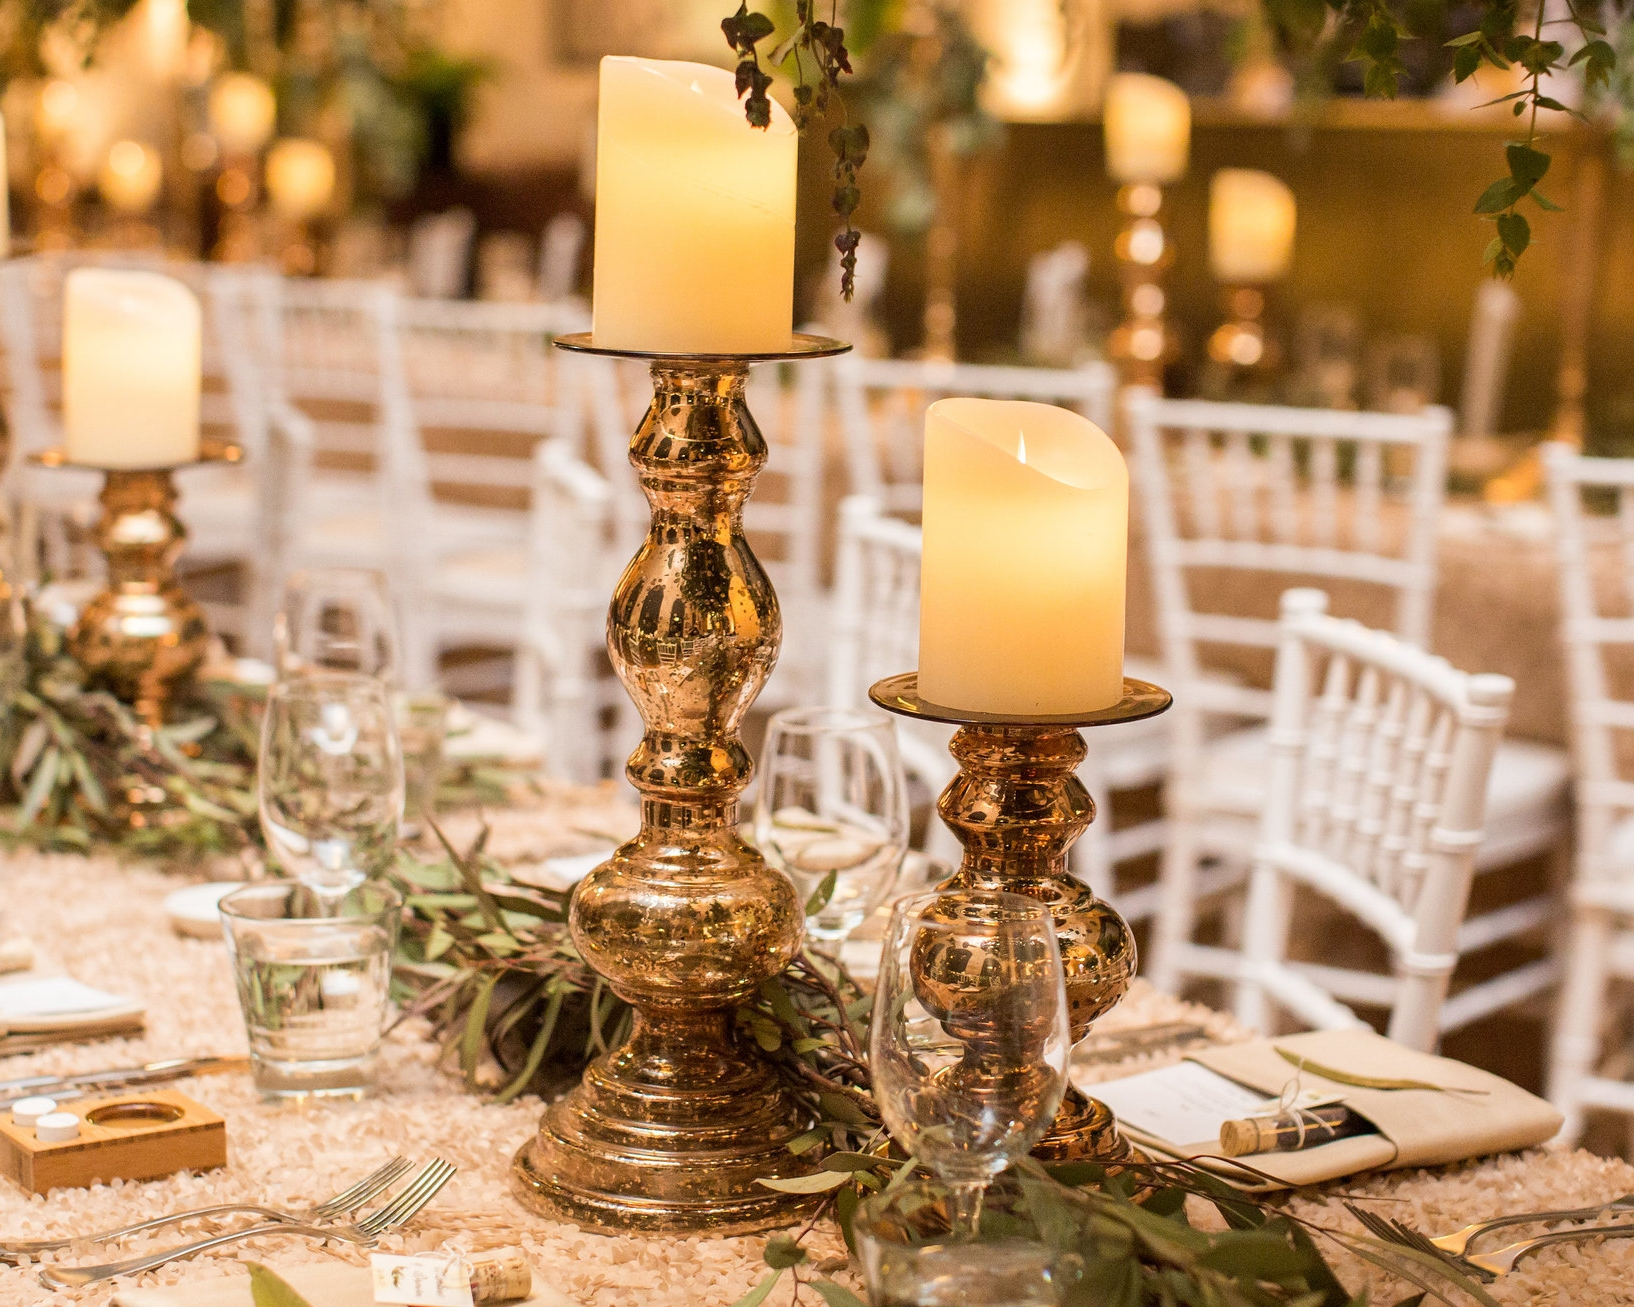 candlesticks & holders